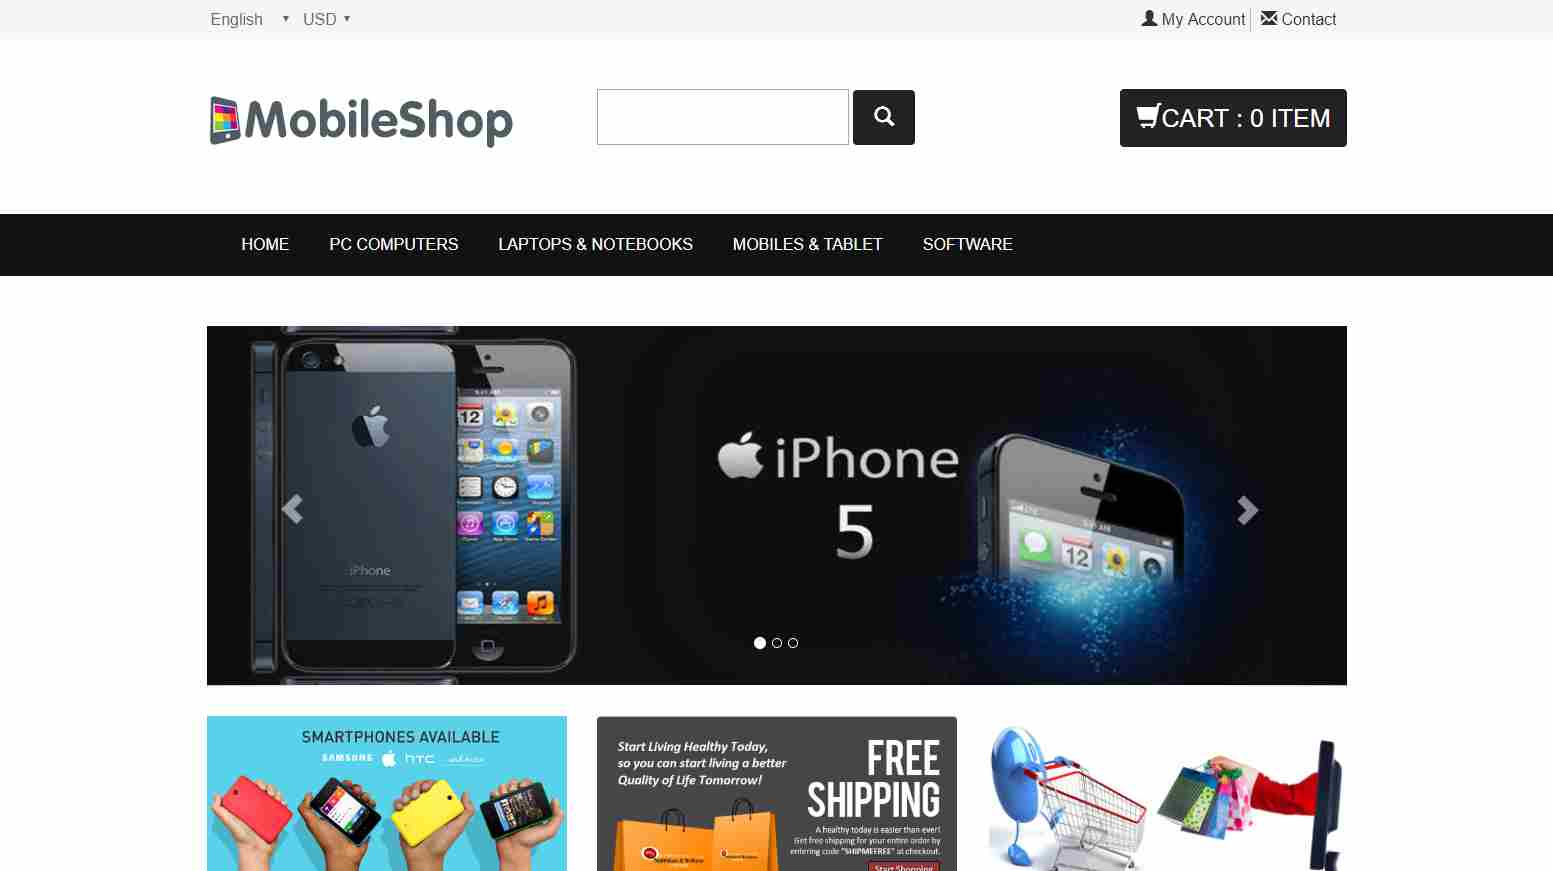 zMobileShop: A Free Bootstrap Theme